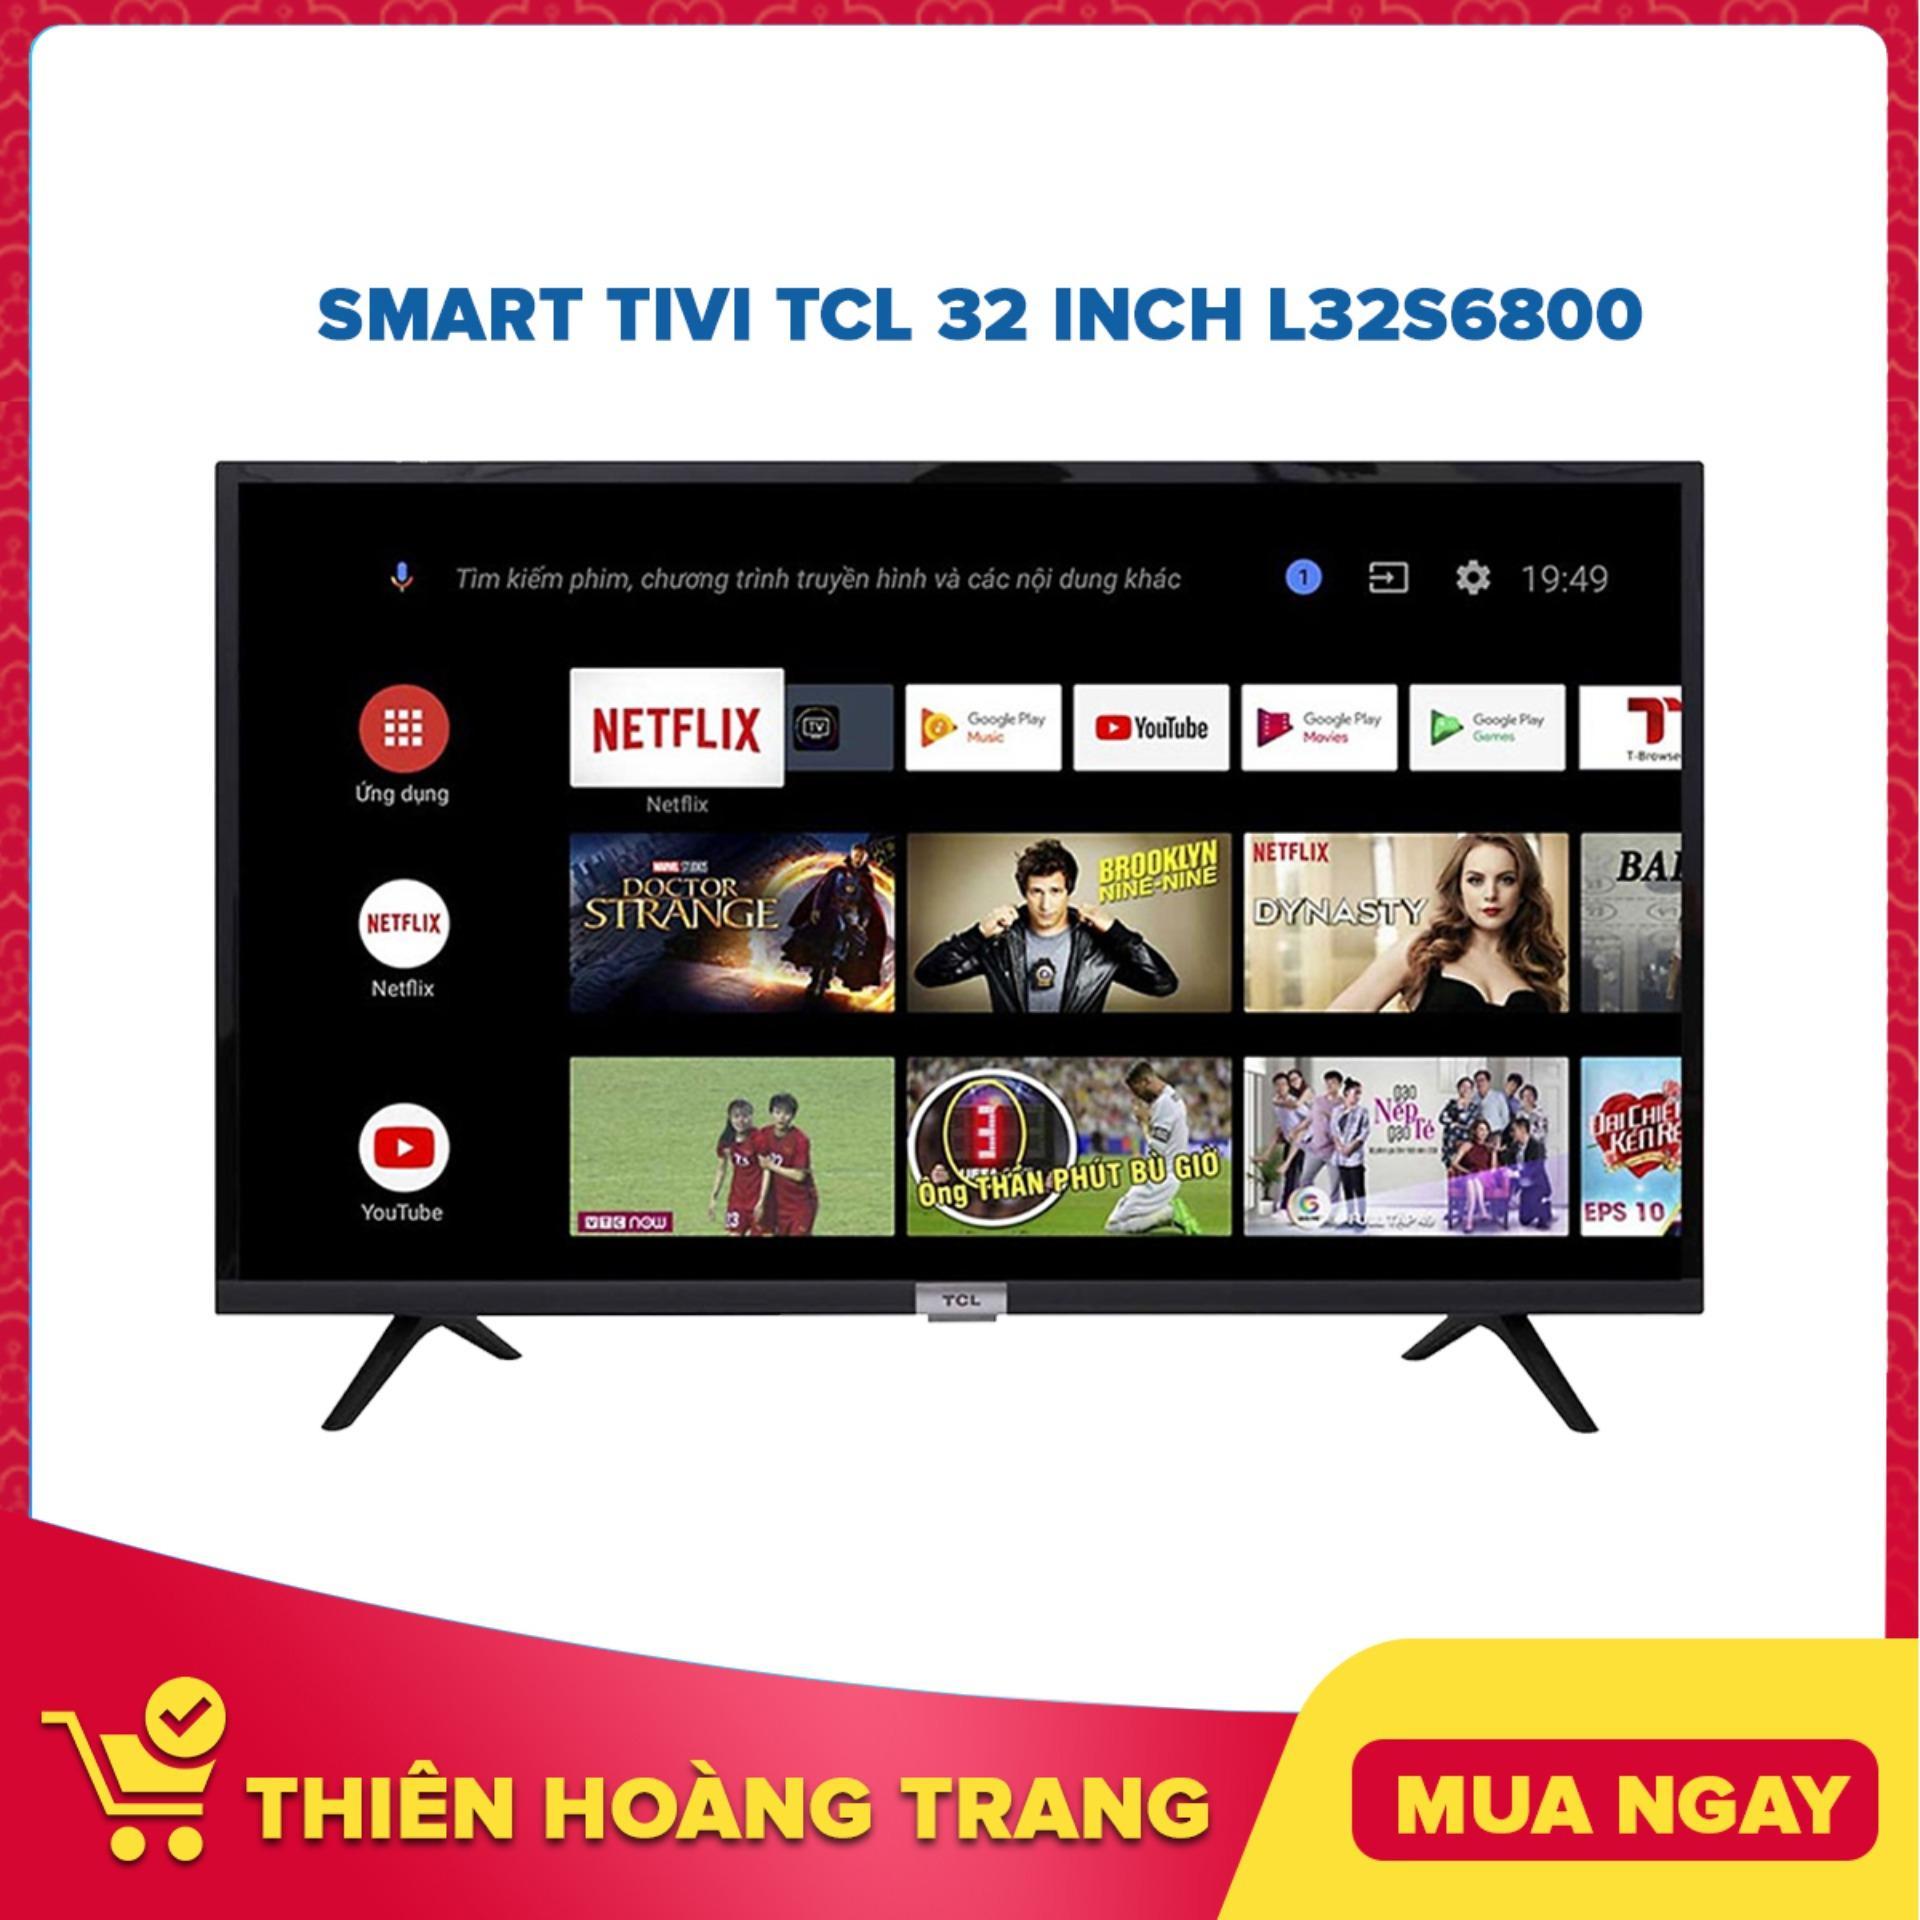 Bảng giá Smart Tivi TCL 32 inch L32S6800